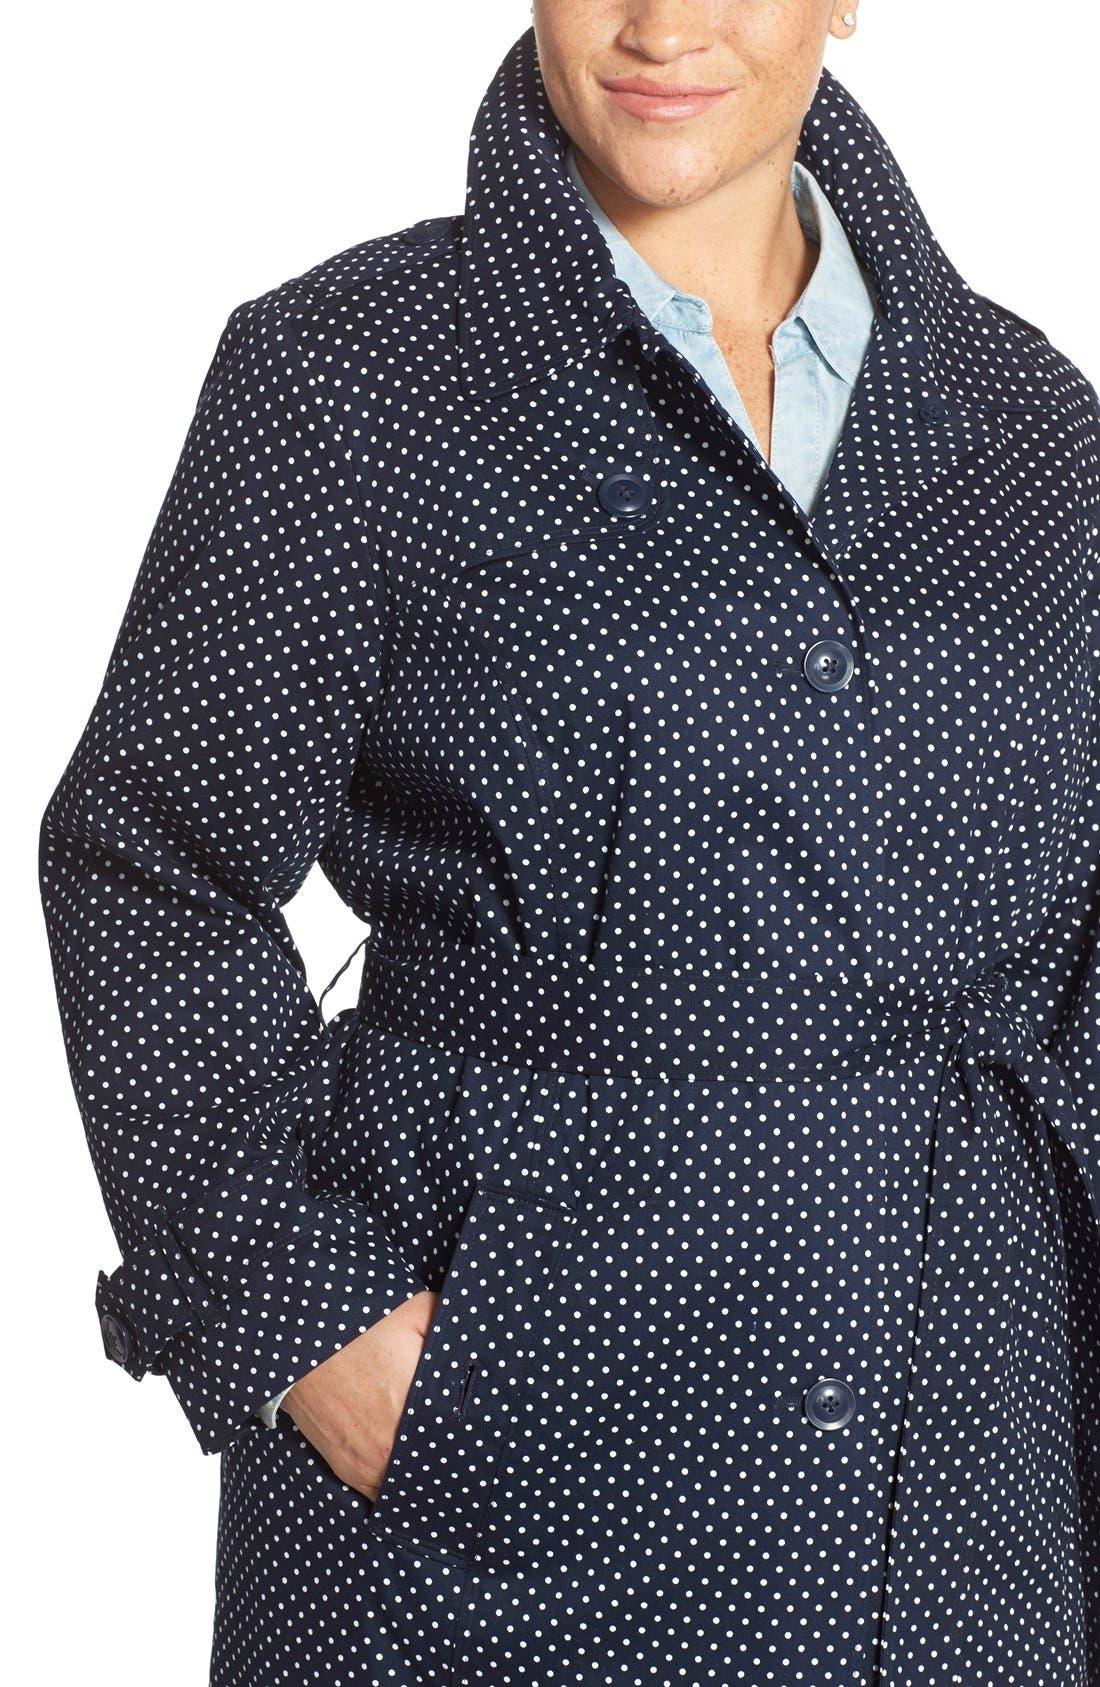 Alternate Image 4  - London Fog Polka Dot Single Breasted Trench Coat (Plus Size)